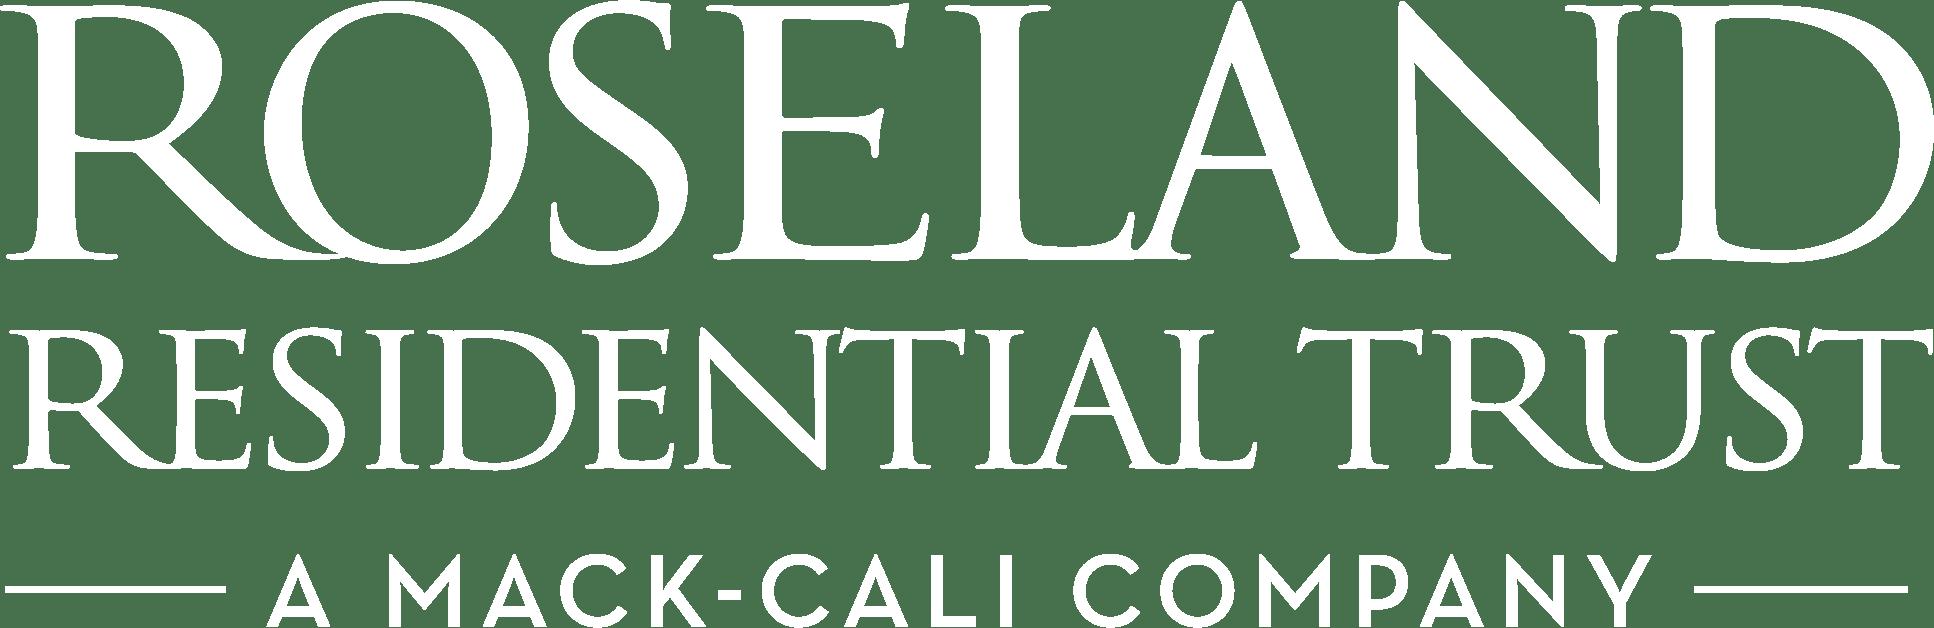 Roseland Property Company